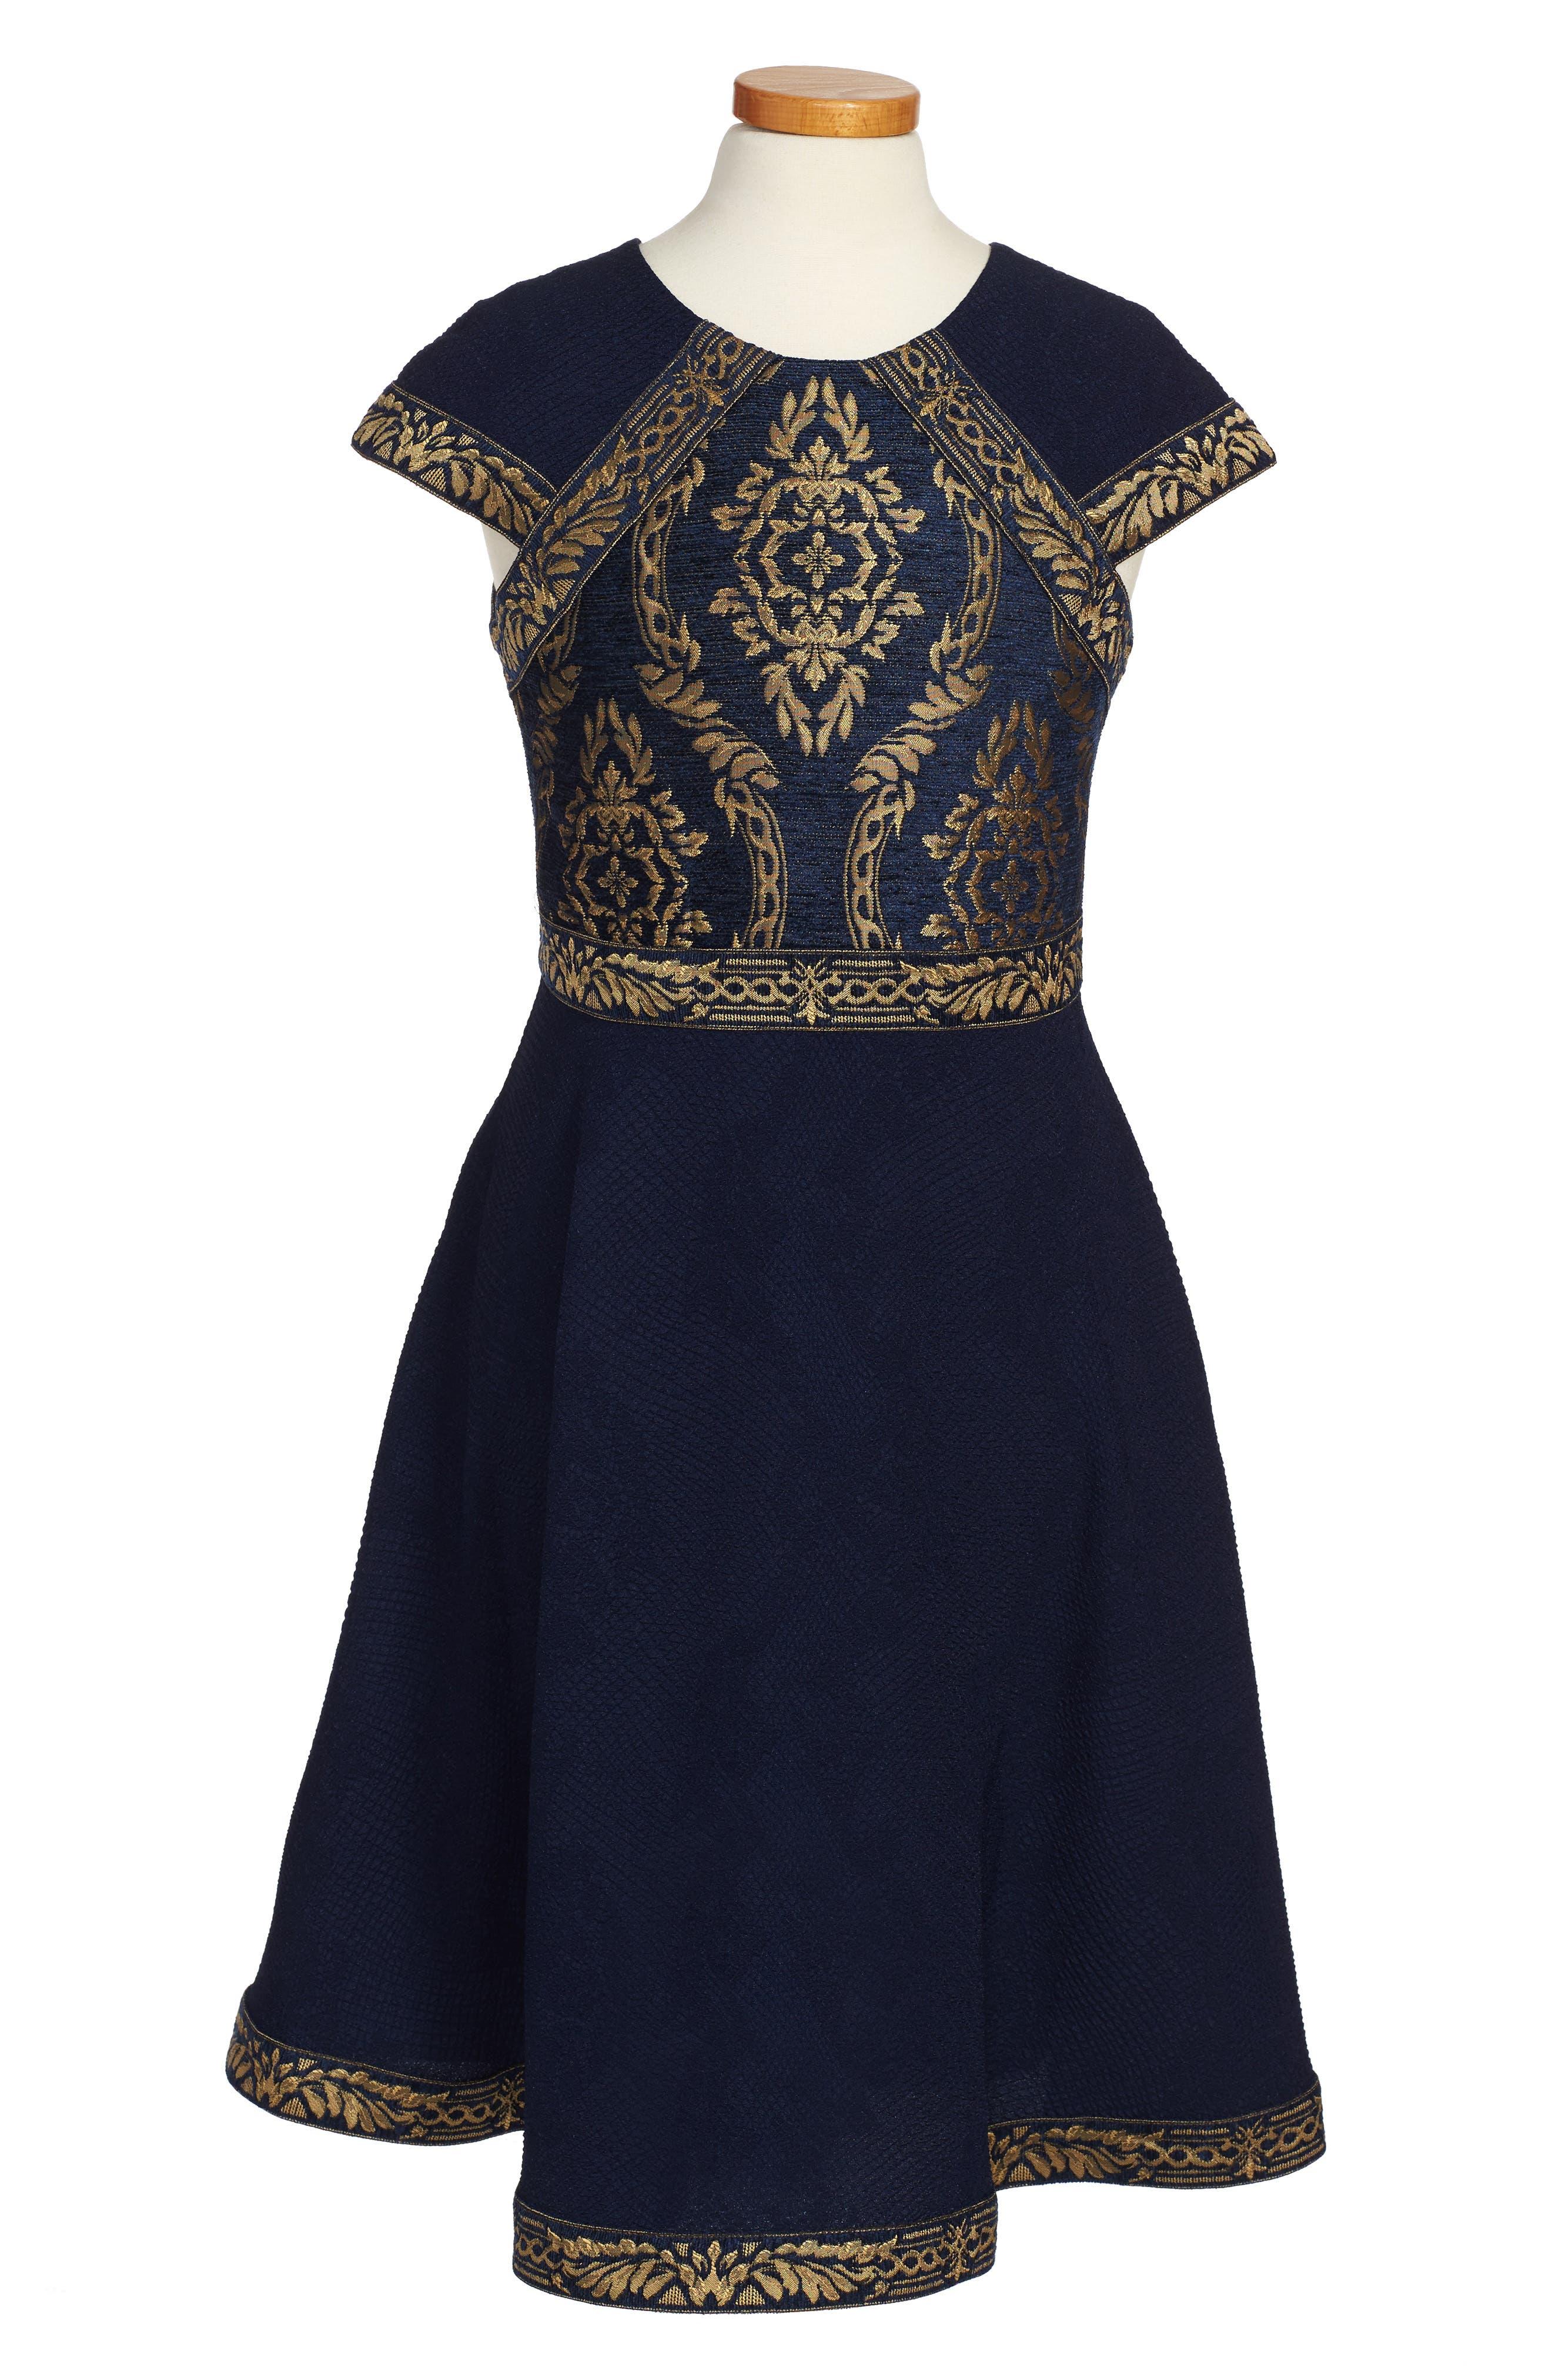 Tadashi Shoji Brocade Embroidery Party Dress (Toddler Girls, Little Girls & Big Girls)